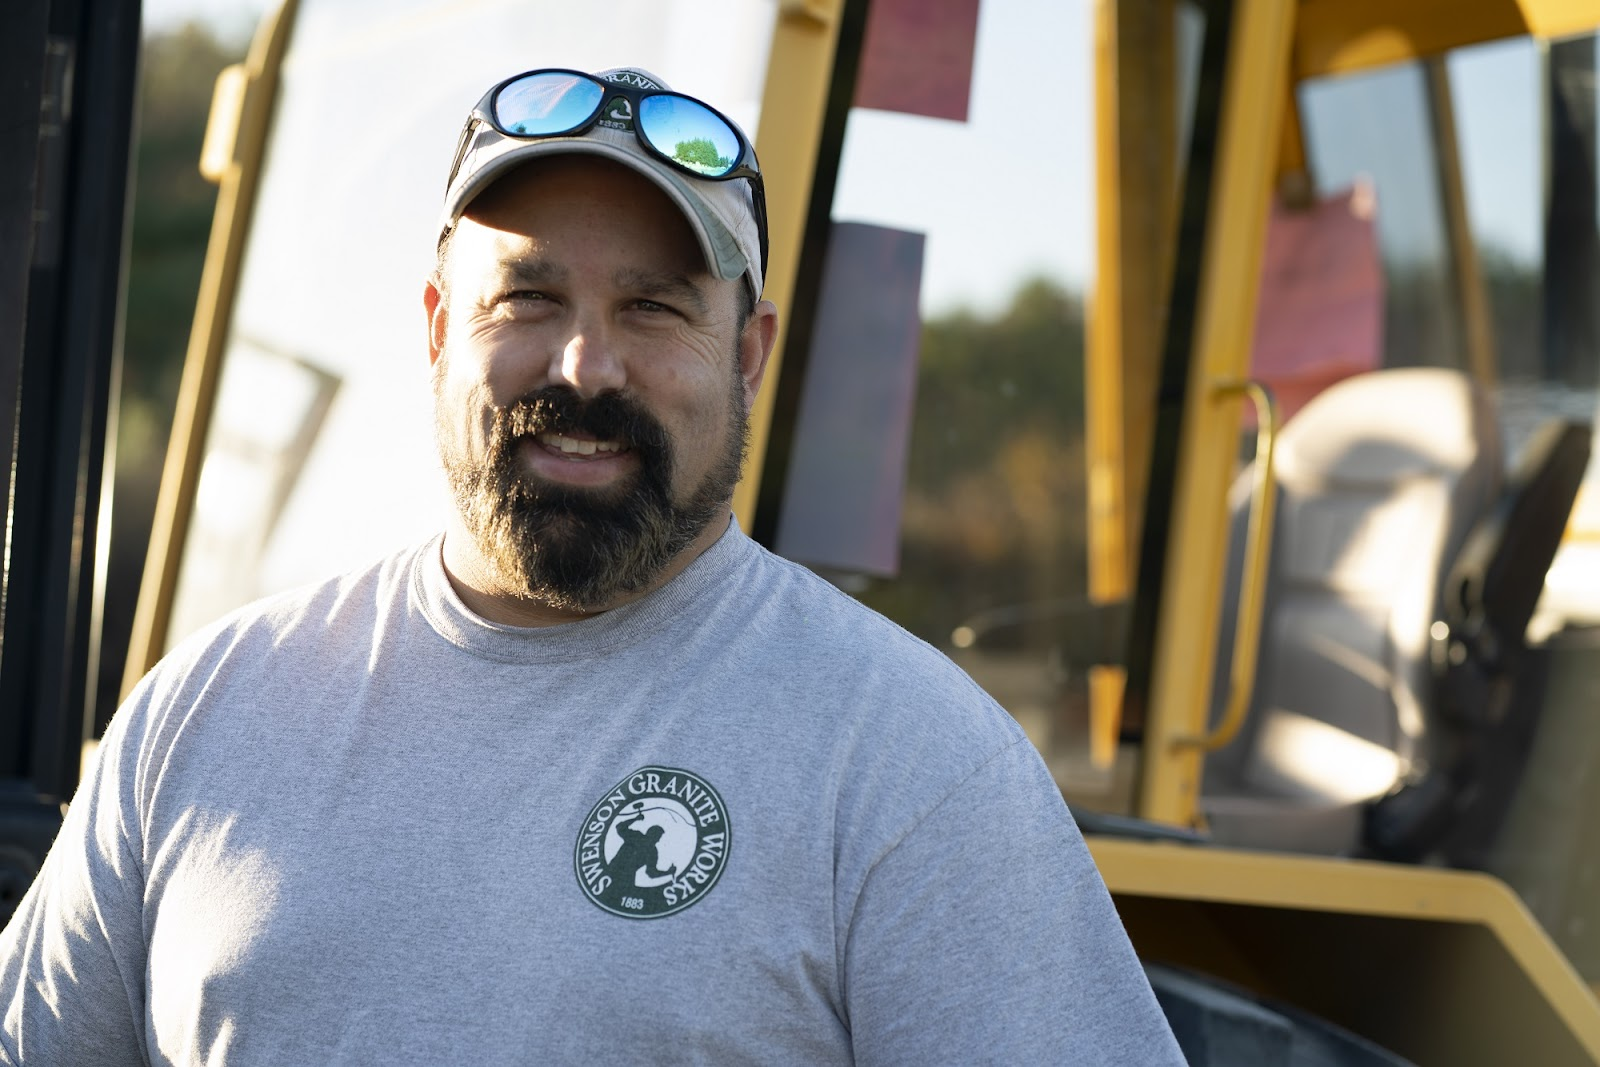 Tony Cherella, Swenson Granite Works Medway Store Yard Foreman